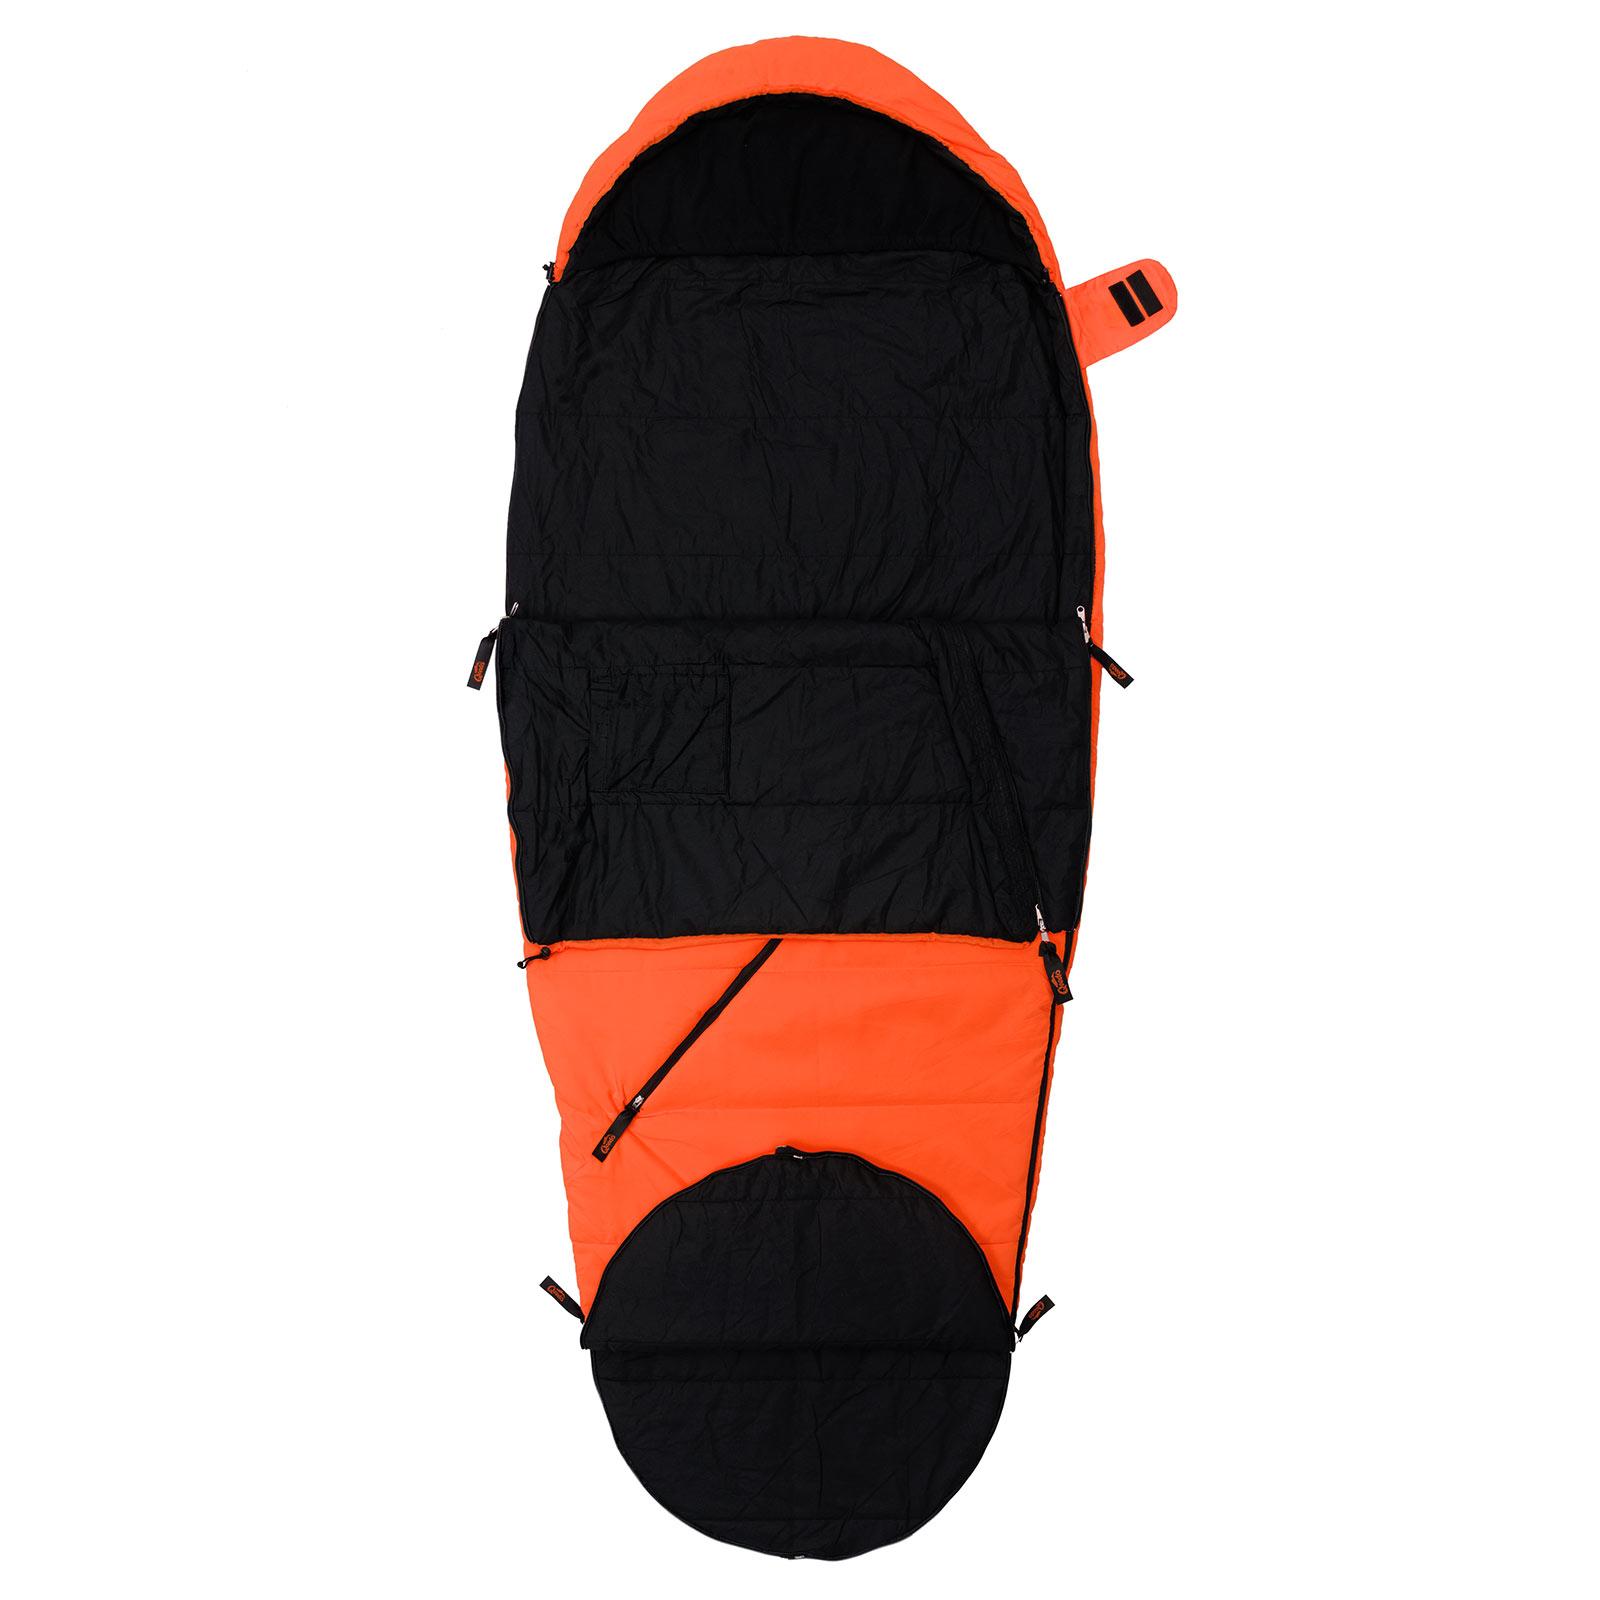 schlafsack camping qeedo buddy orange mumien schlafsack. Black Bedroom Furniture Sets. Home Design Ideas